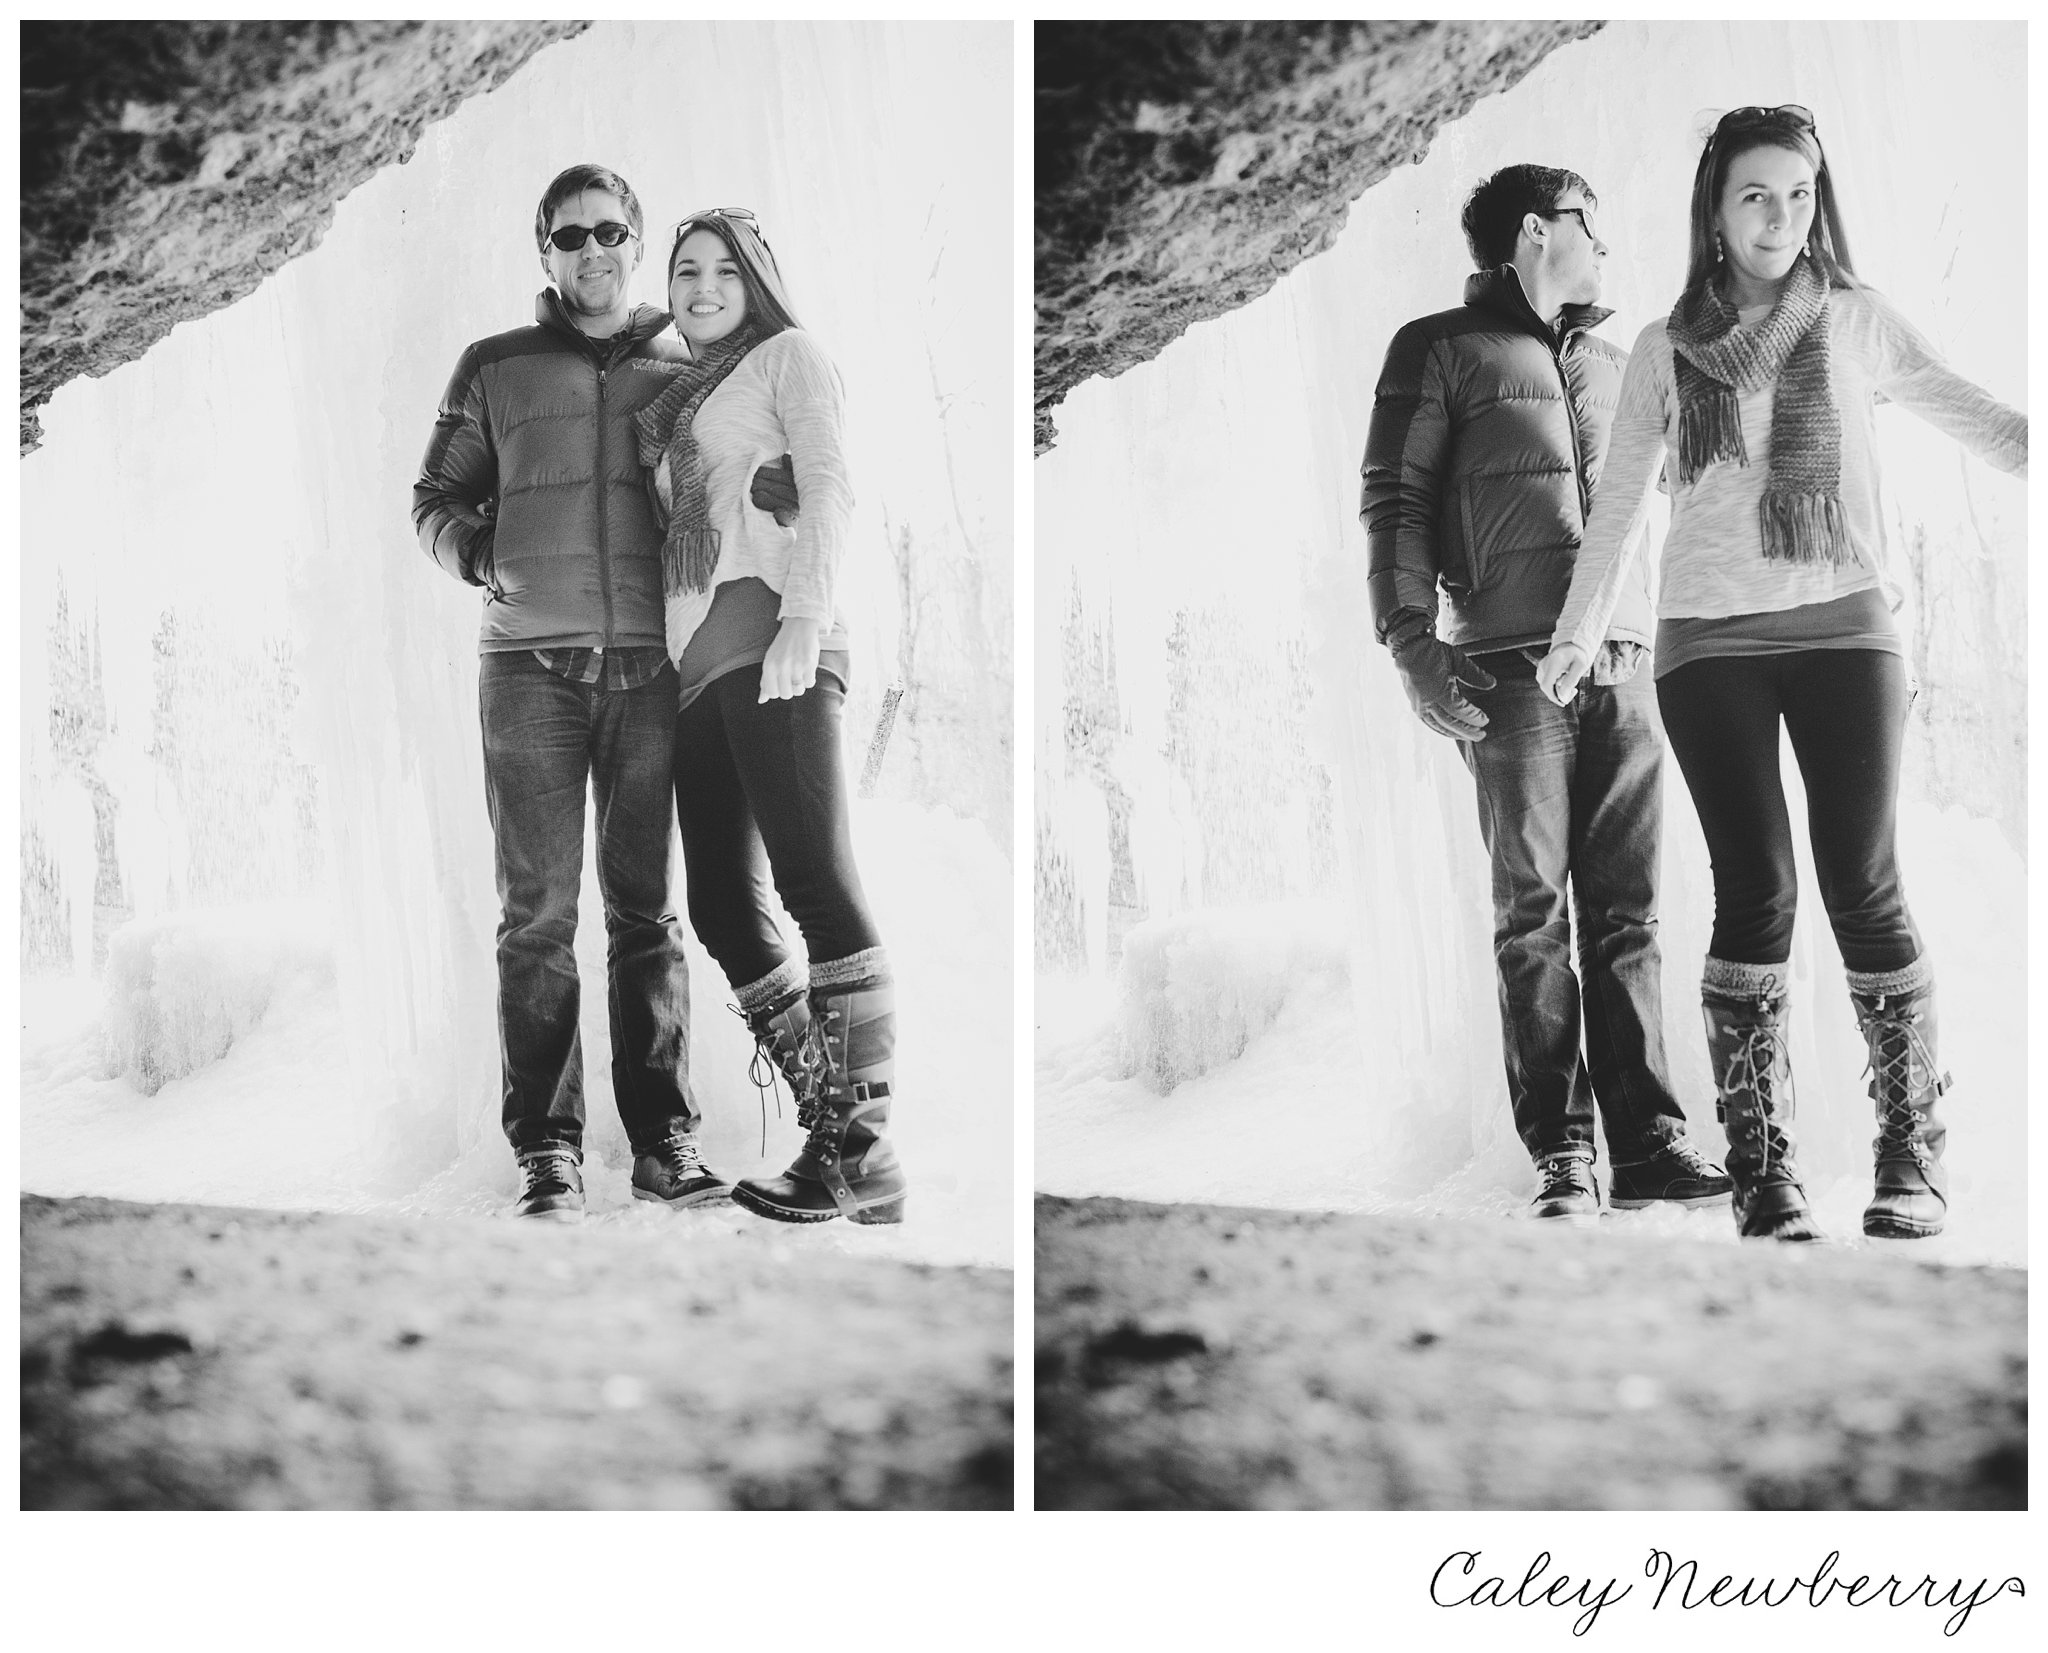 nashville wedding photographer, nashville photographer, stillhouse hollow falls, mt. pleasant photographer, caley newberry photography